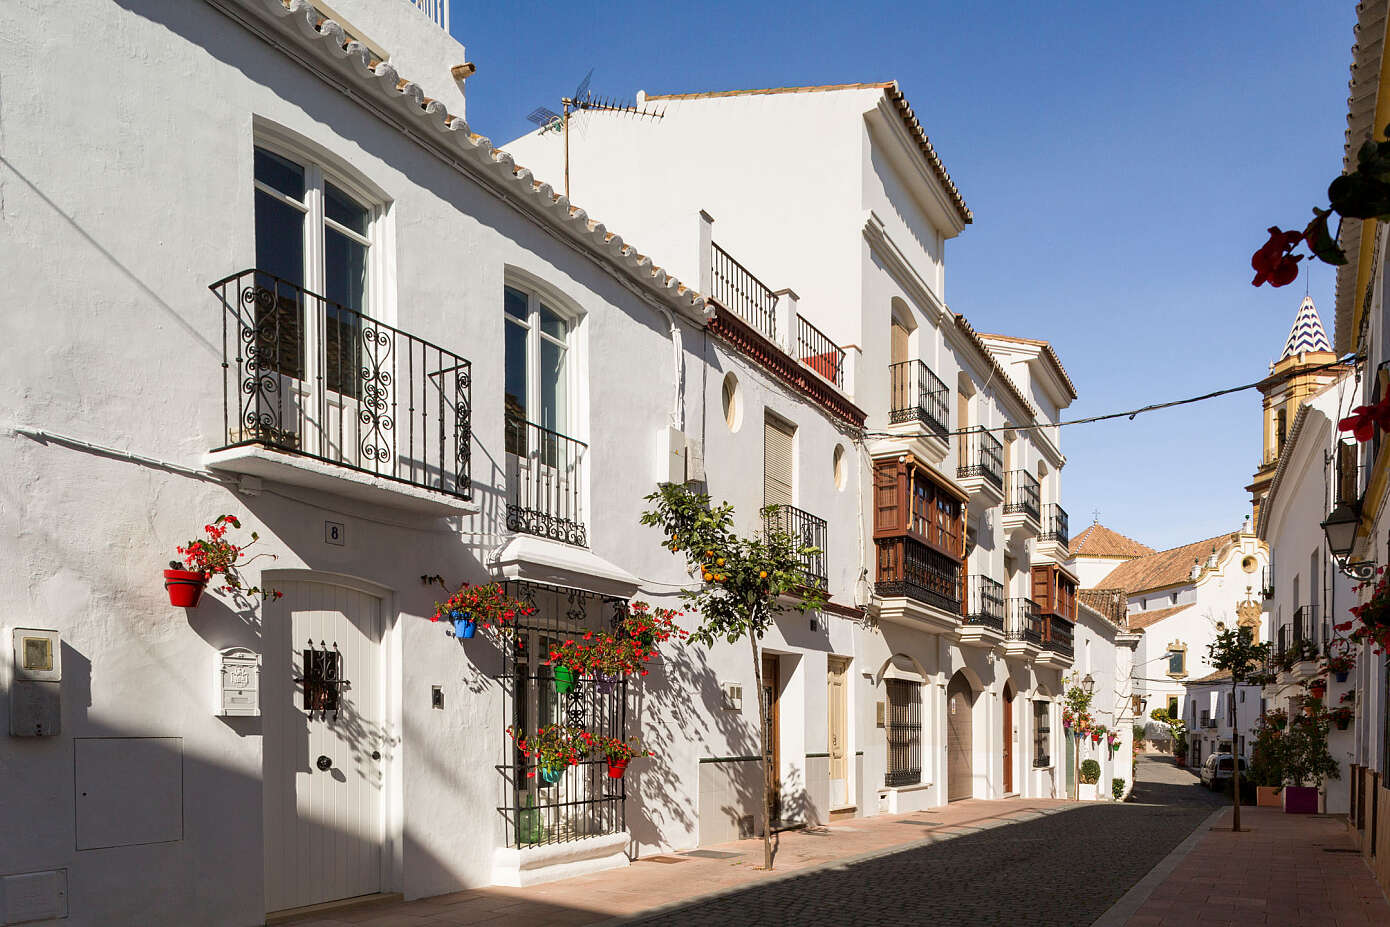 Calle Sevilla by Alejandro Gimenez